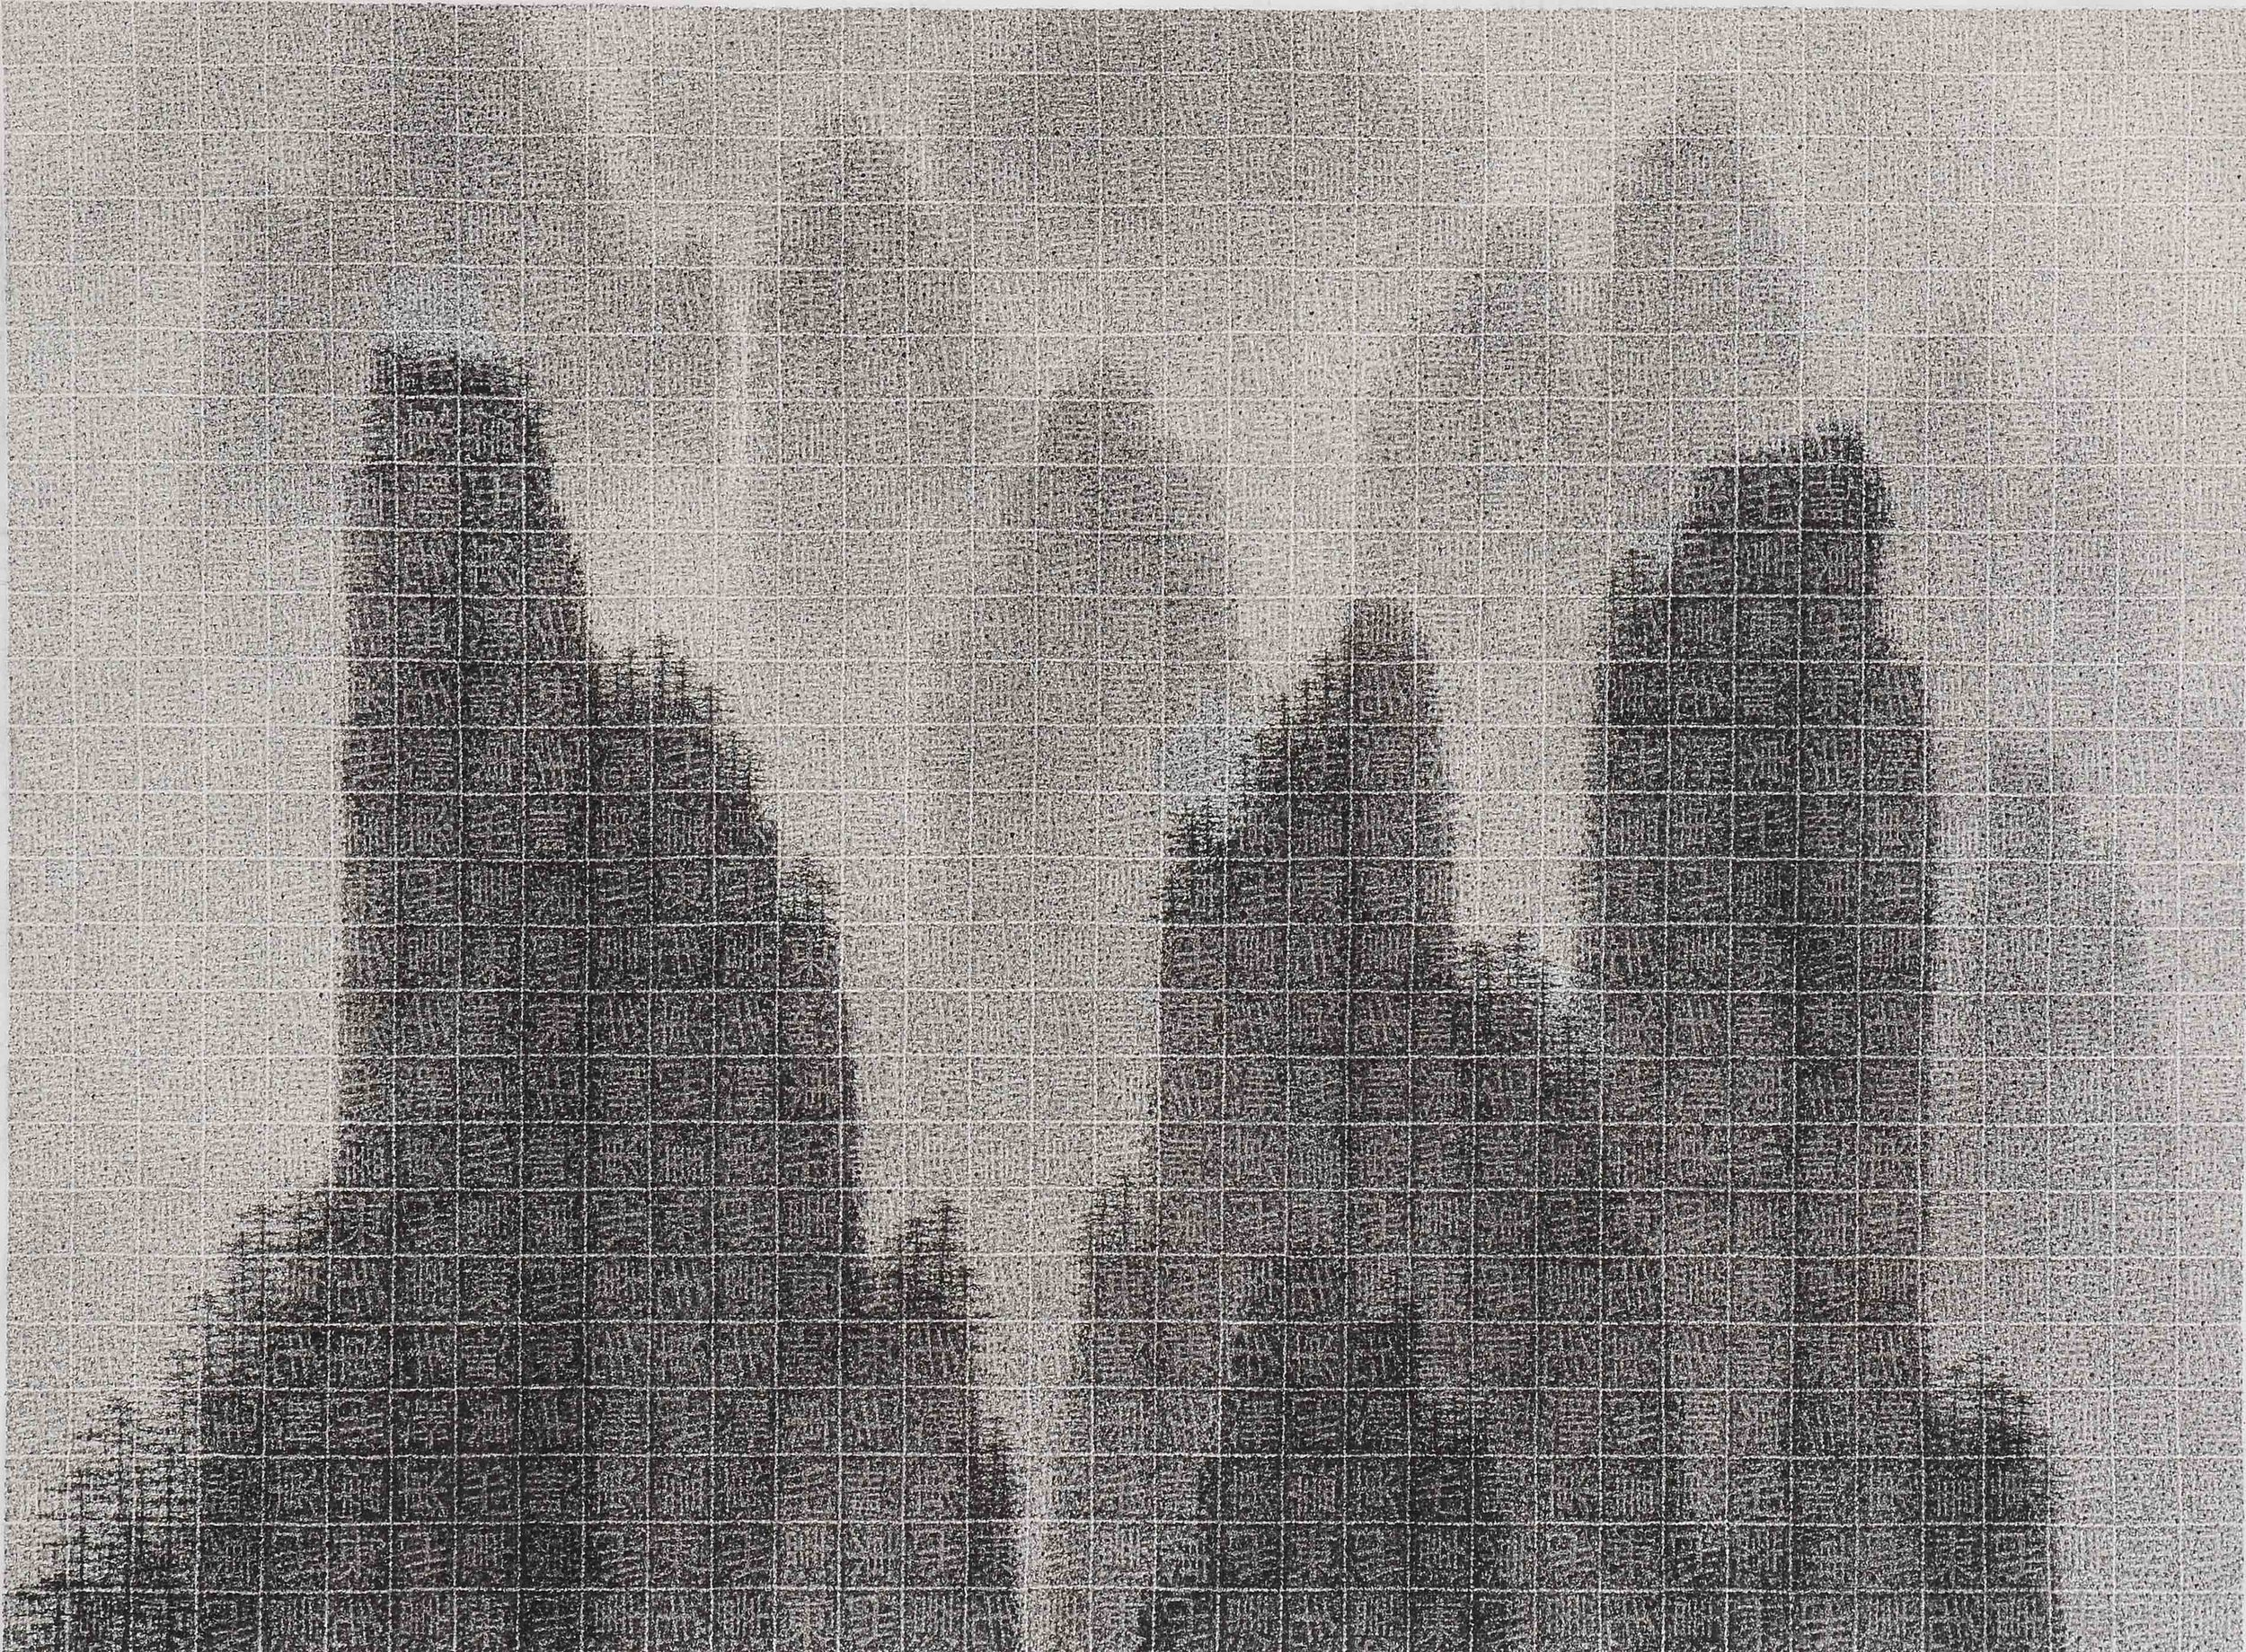 毛澤東山水 Mao Zedong Landscape